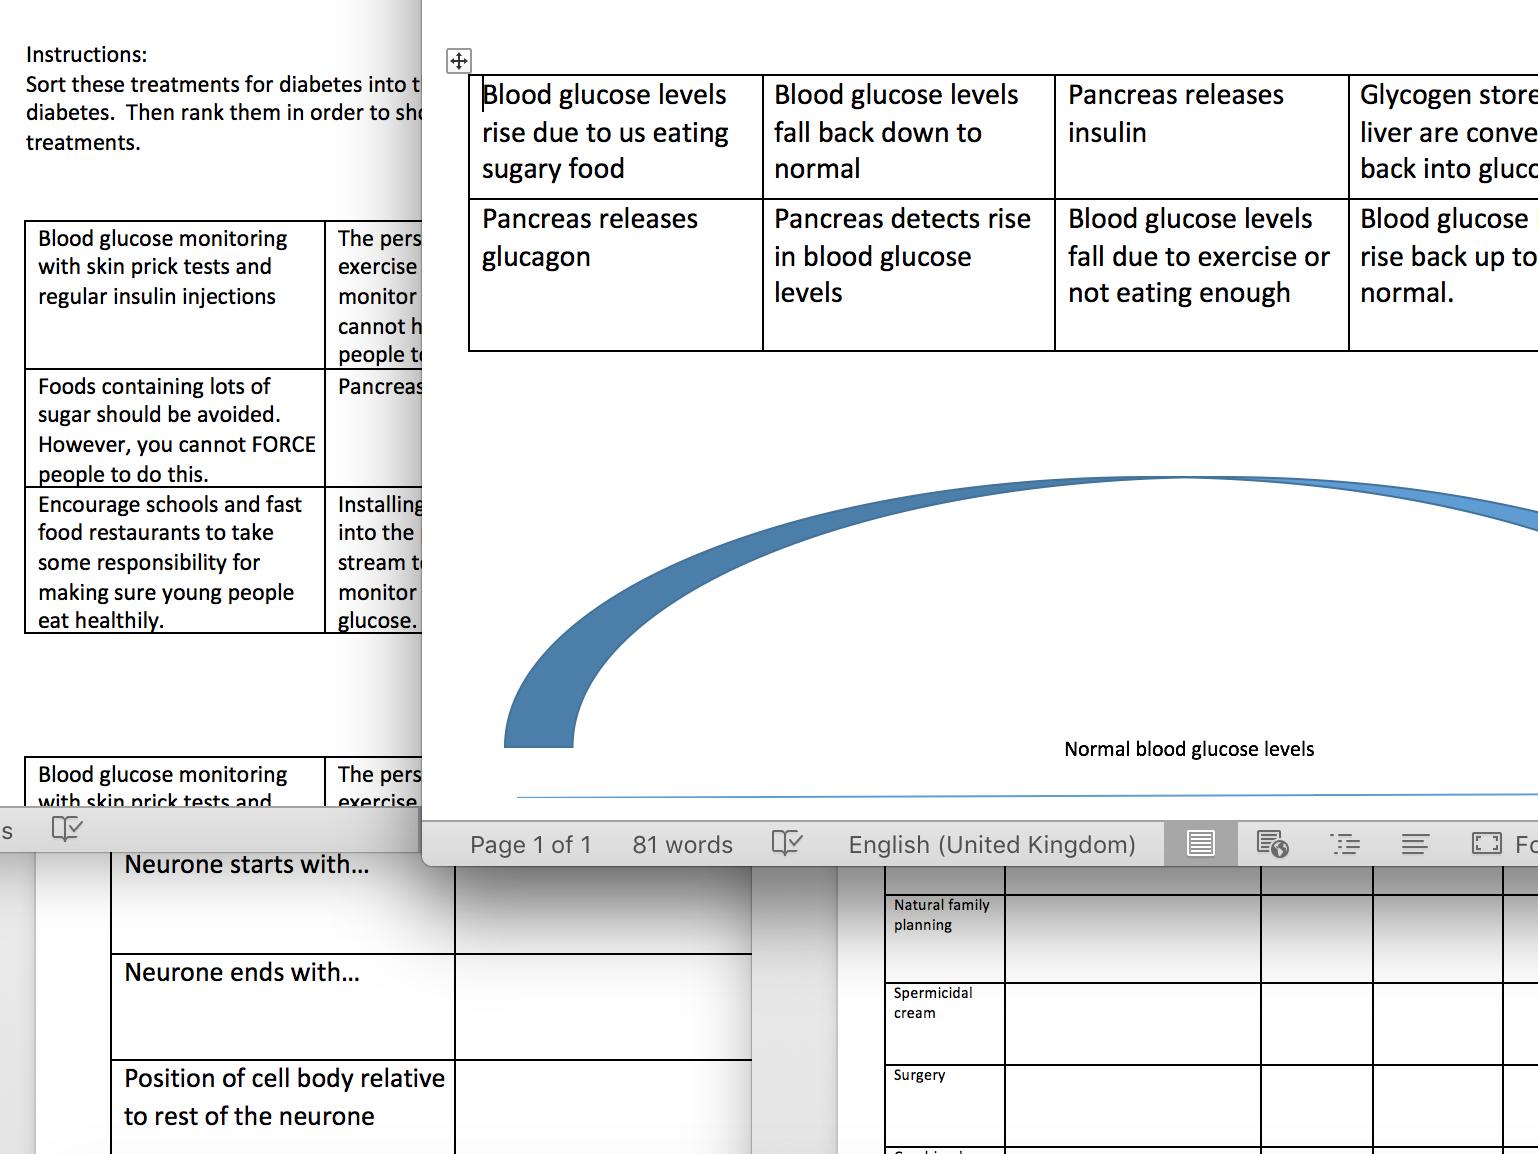 Aqa Biology B5 Blood Glucose Negative Feedback Worksheet